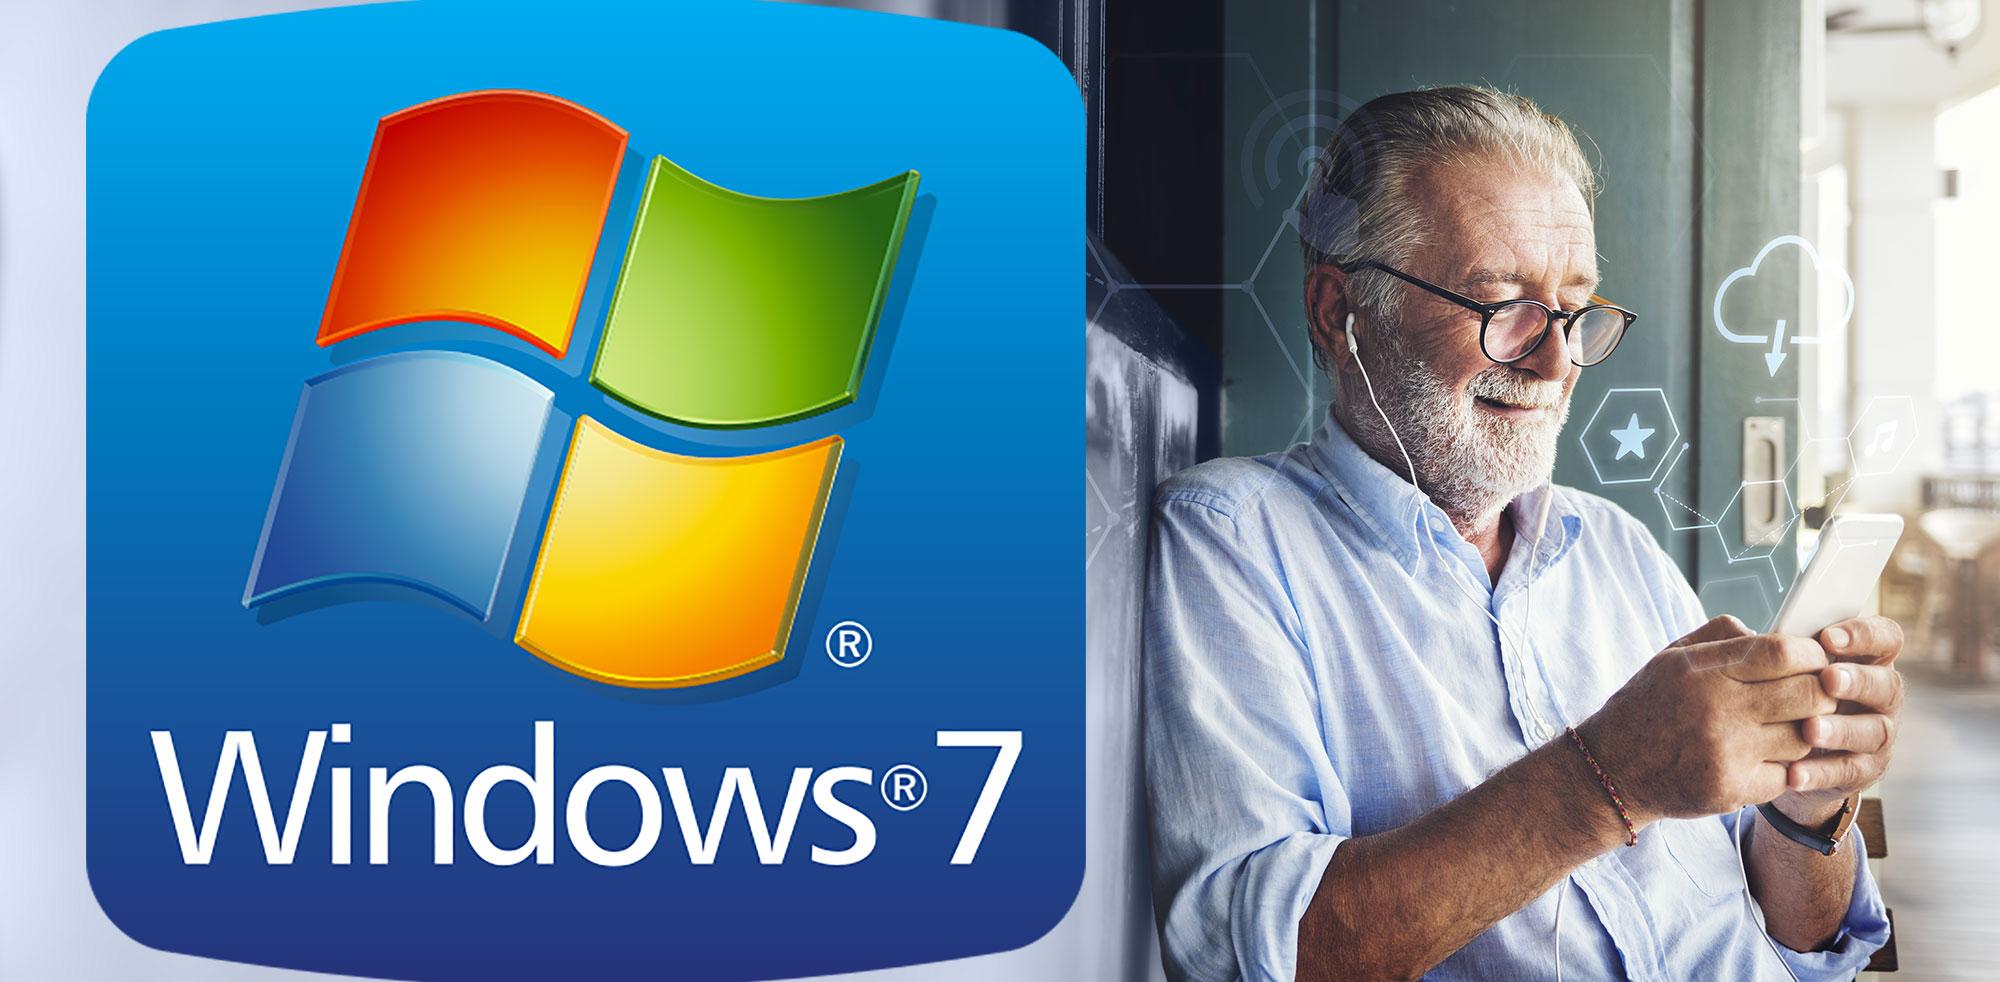 Windows 7 va in pensione